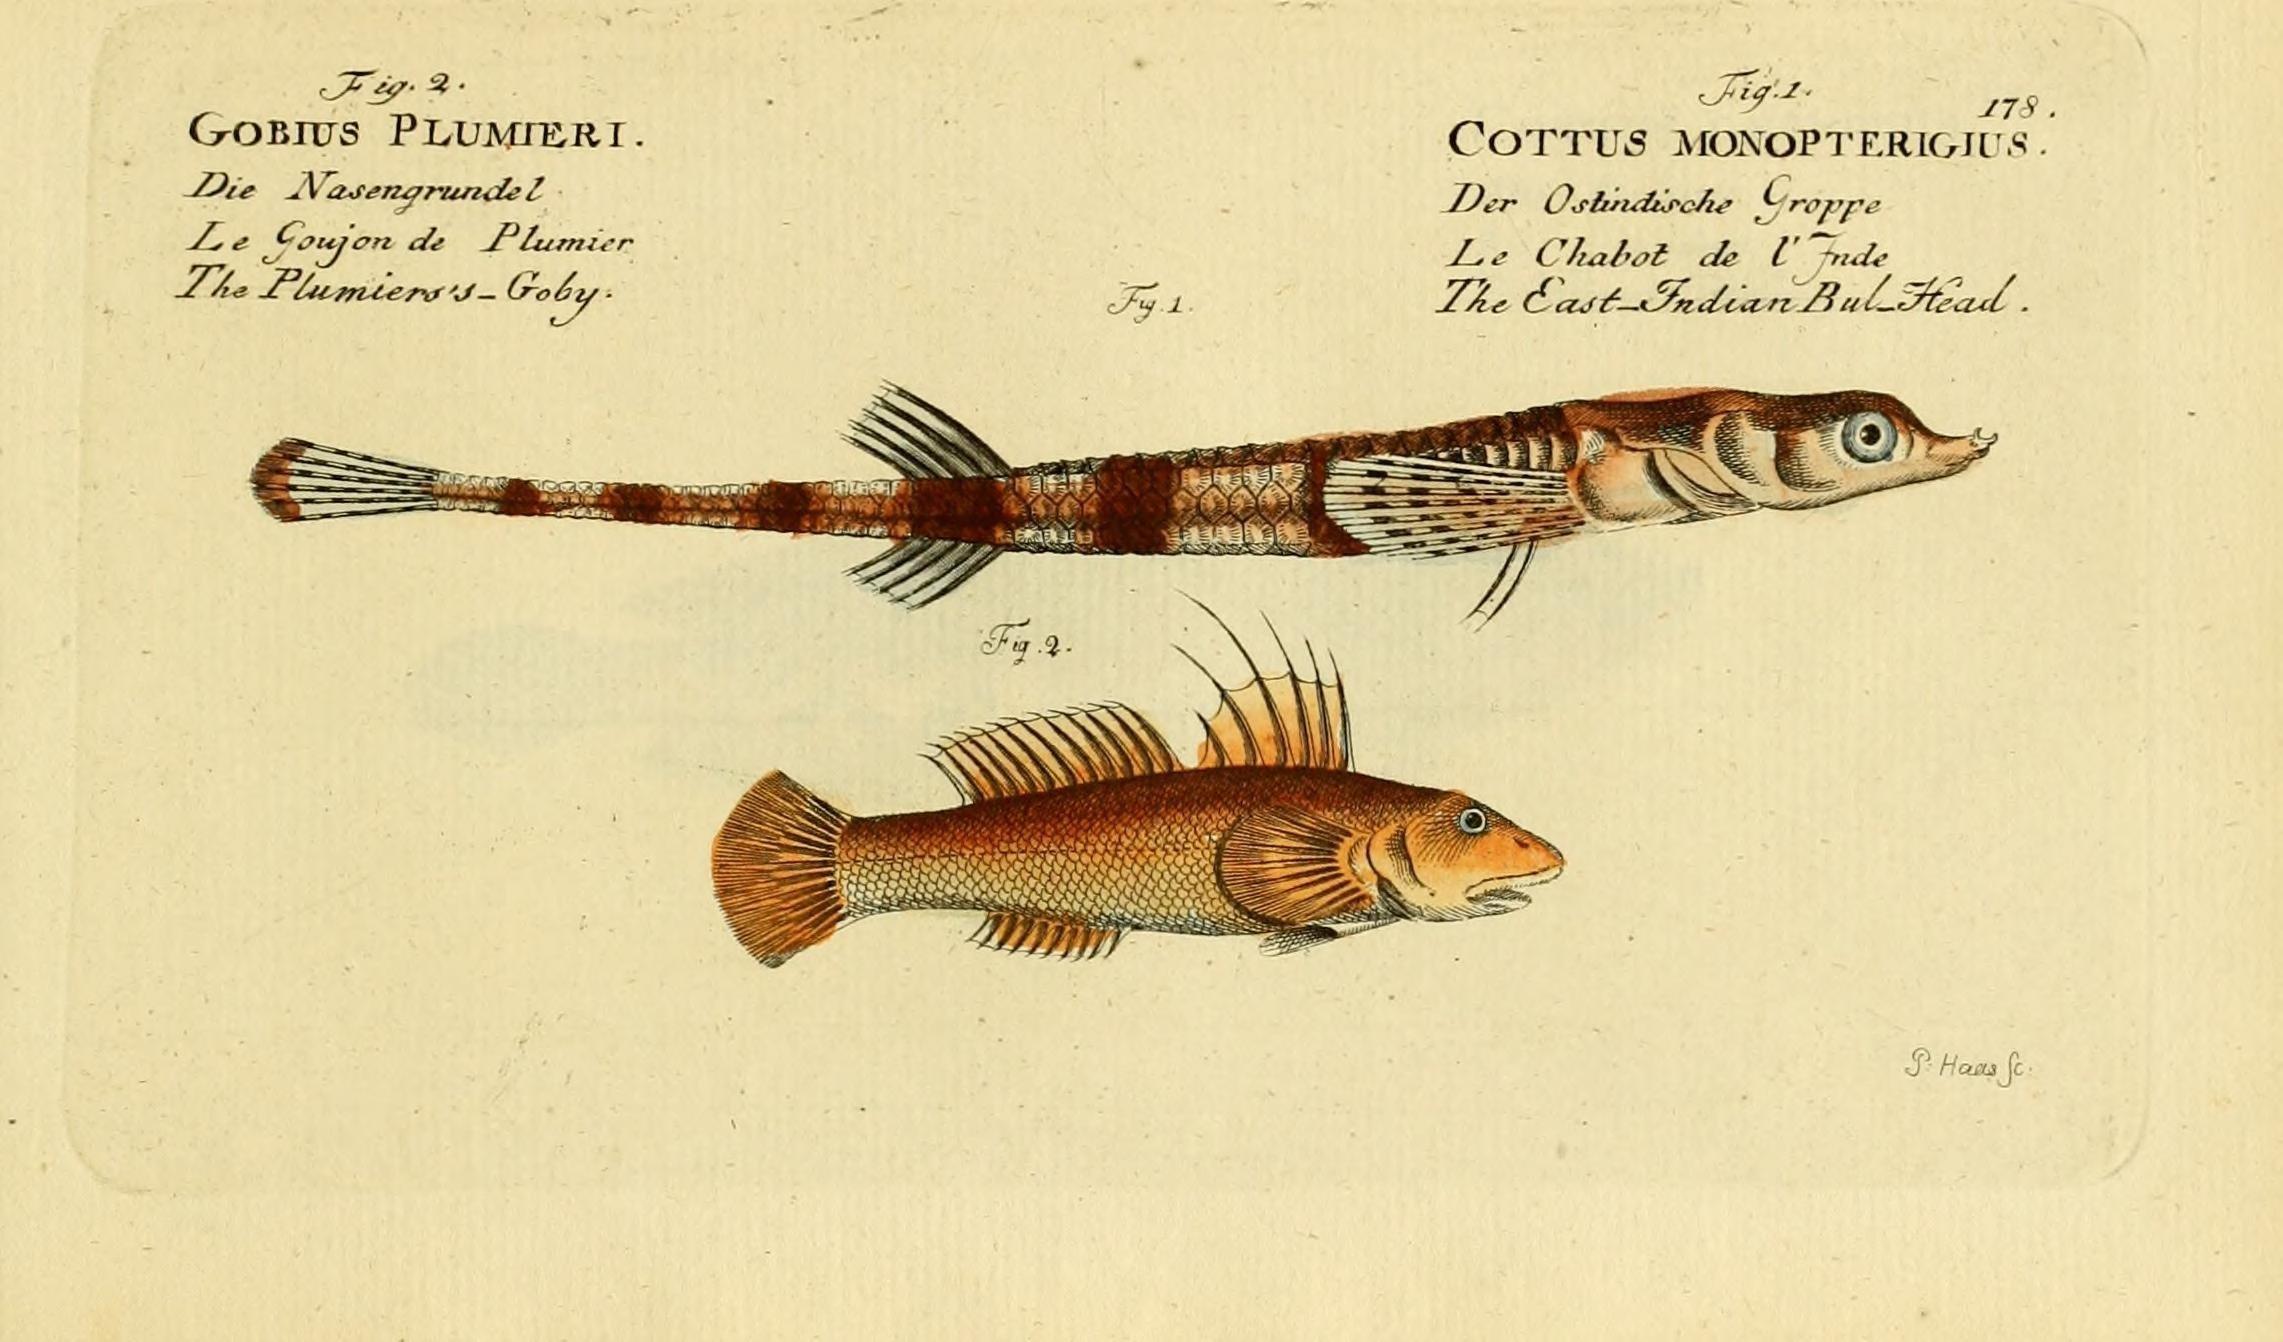 Image of alligatorfish